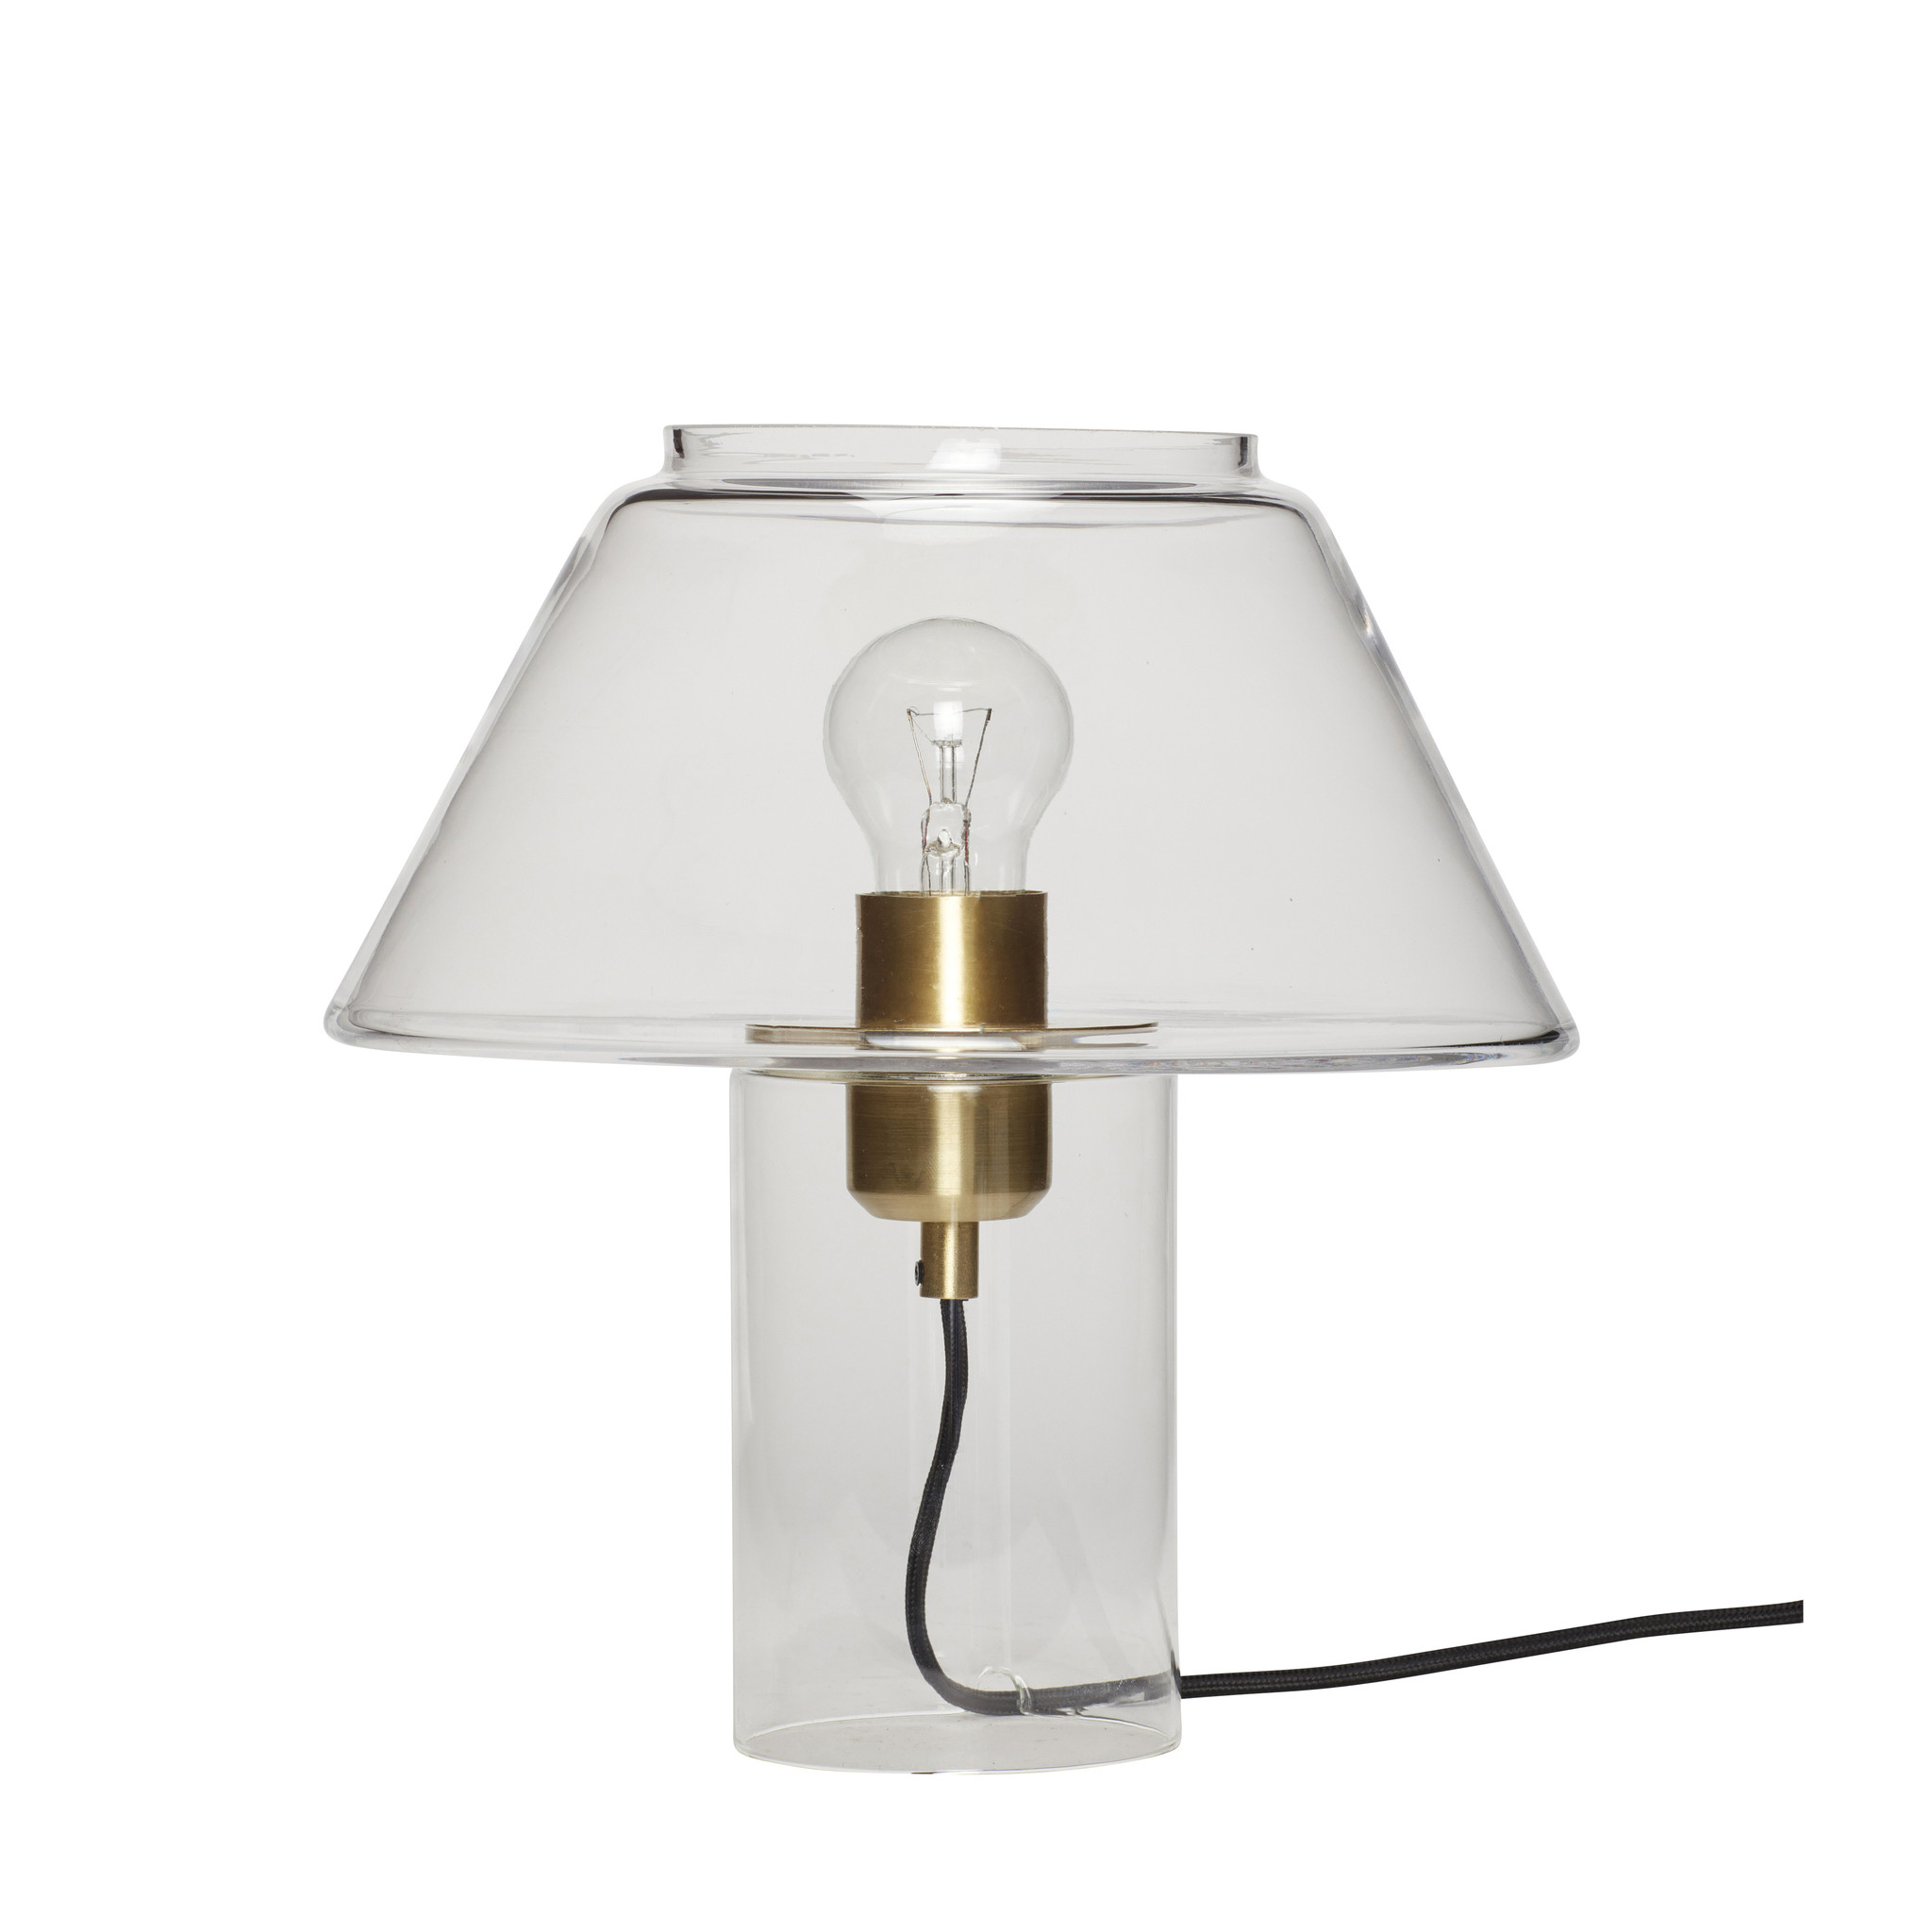 Hubsch Tafellamp, glas, messing / helder